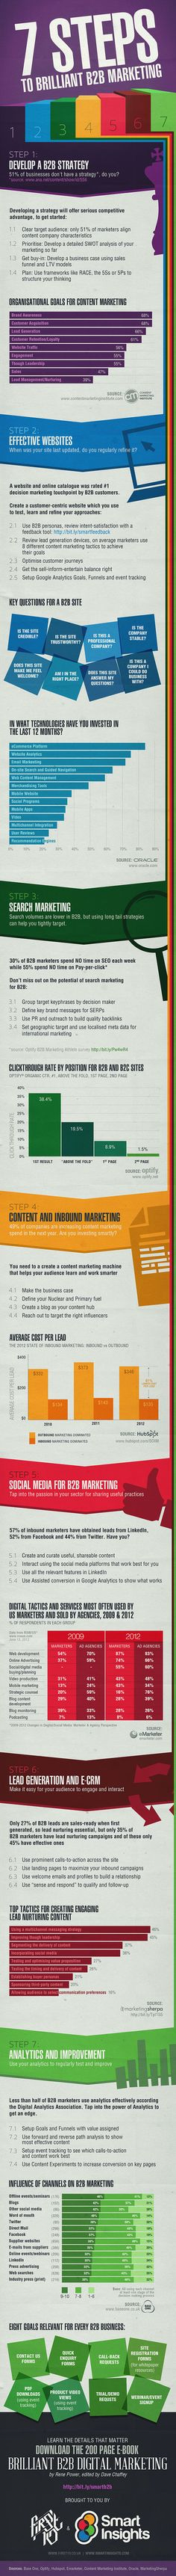 7 Steps To A Brilliant B2B Marketing Plan #infographic